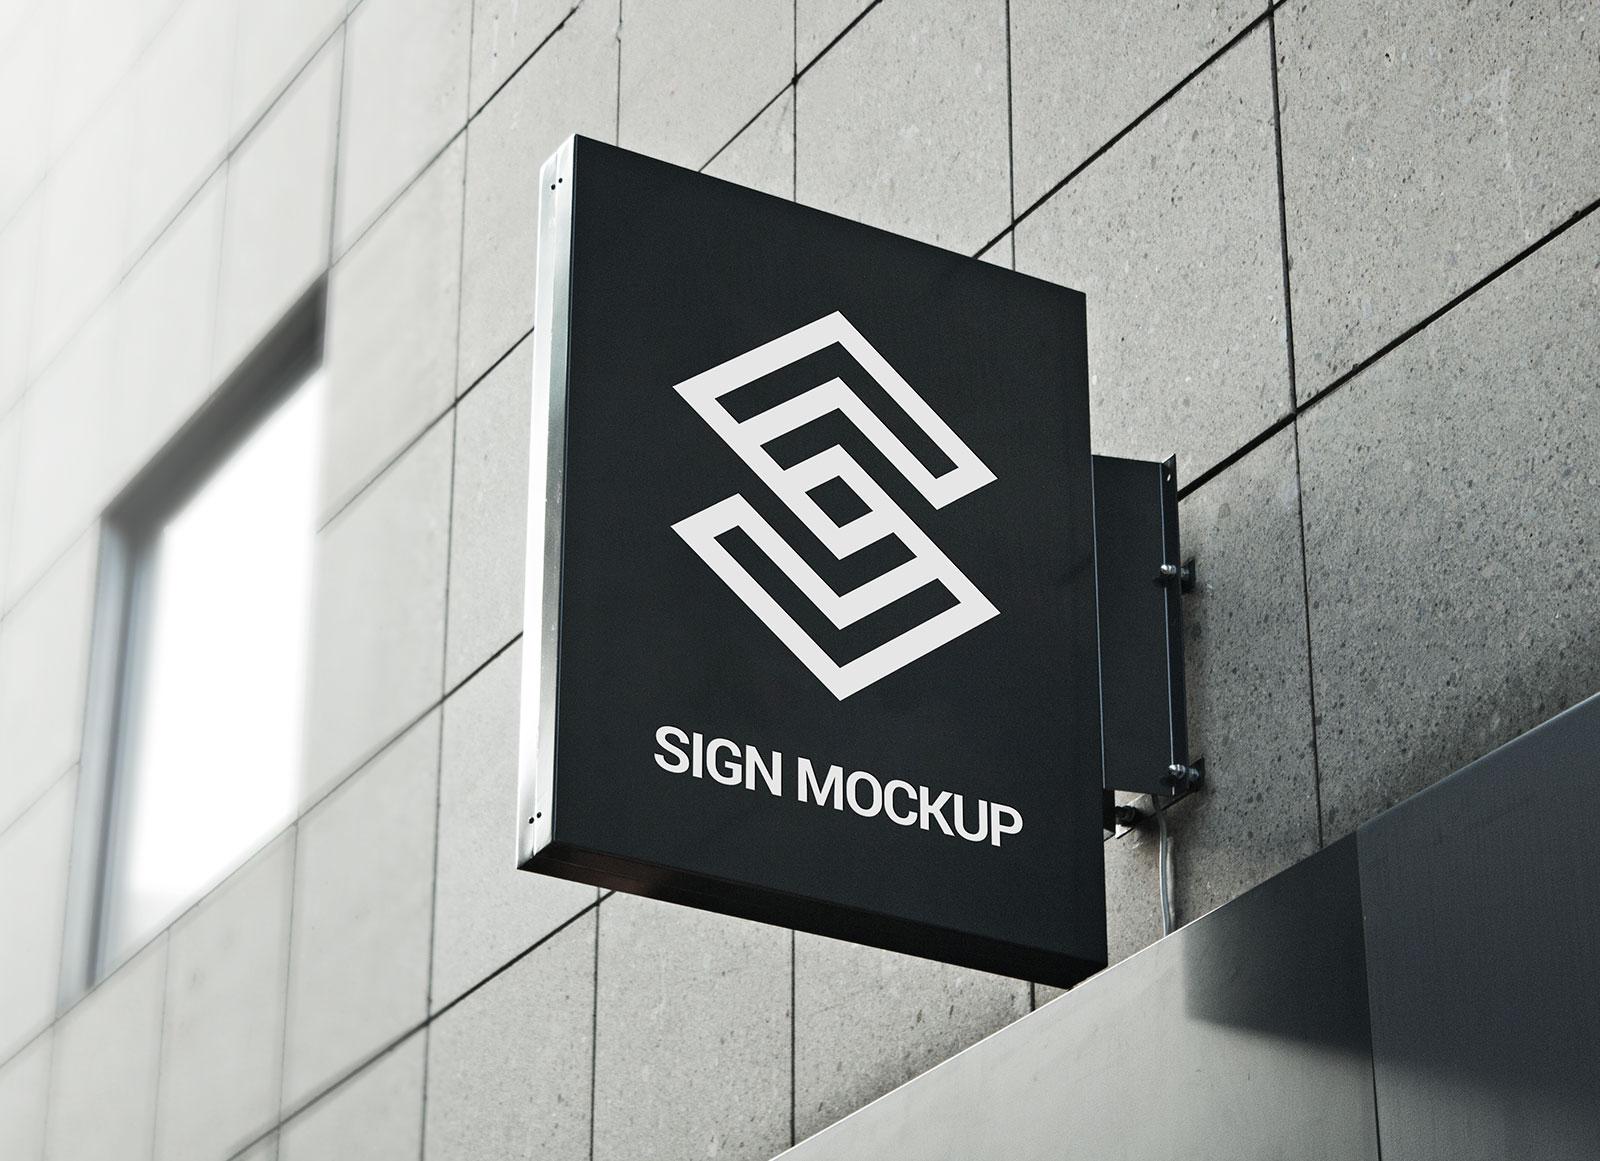 Free Square Hanging Wall Sign Mockup PSD